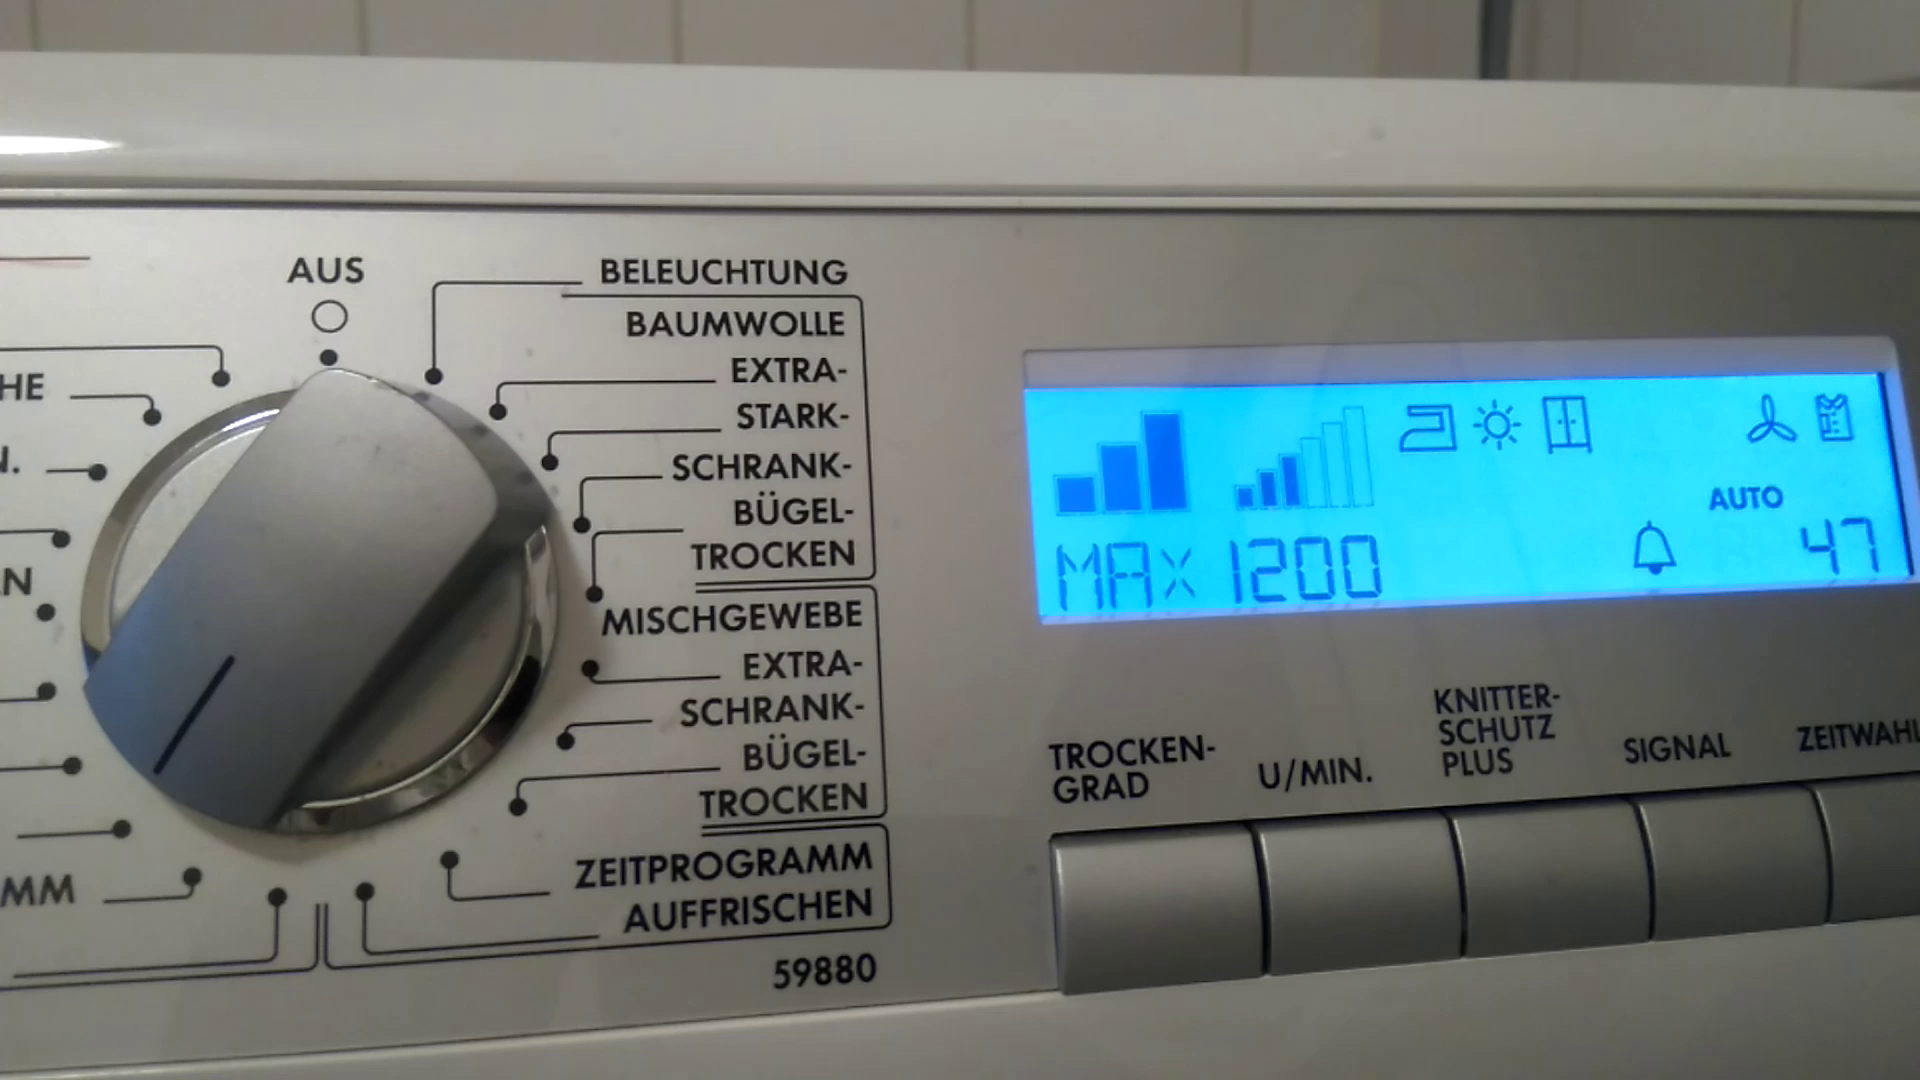 Aeg trockner lavatherm protex bedienungsanleitung: kondenstrockner